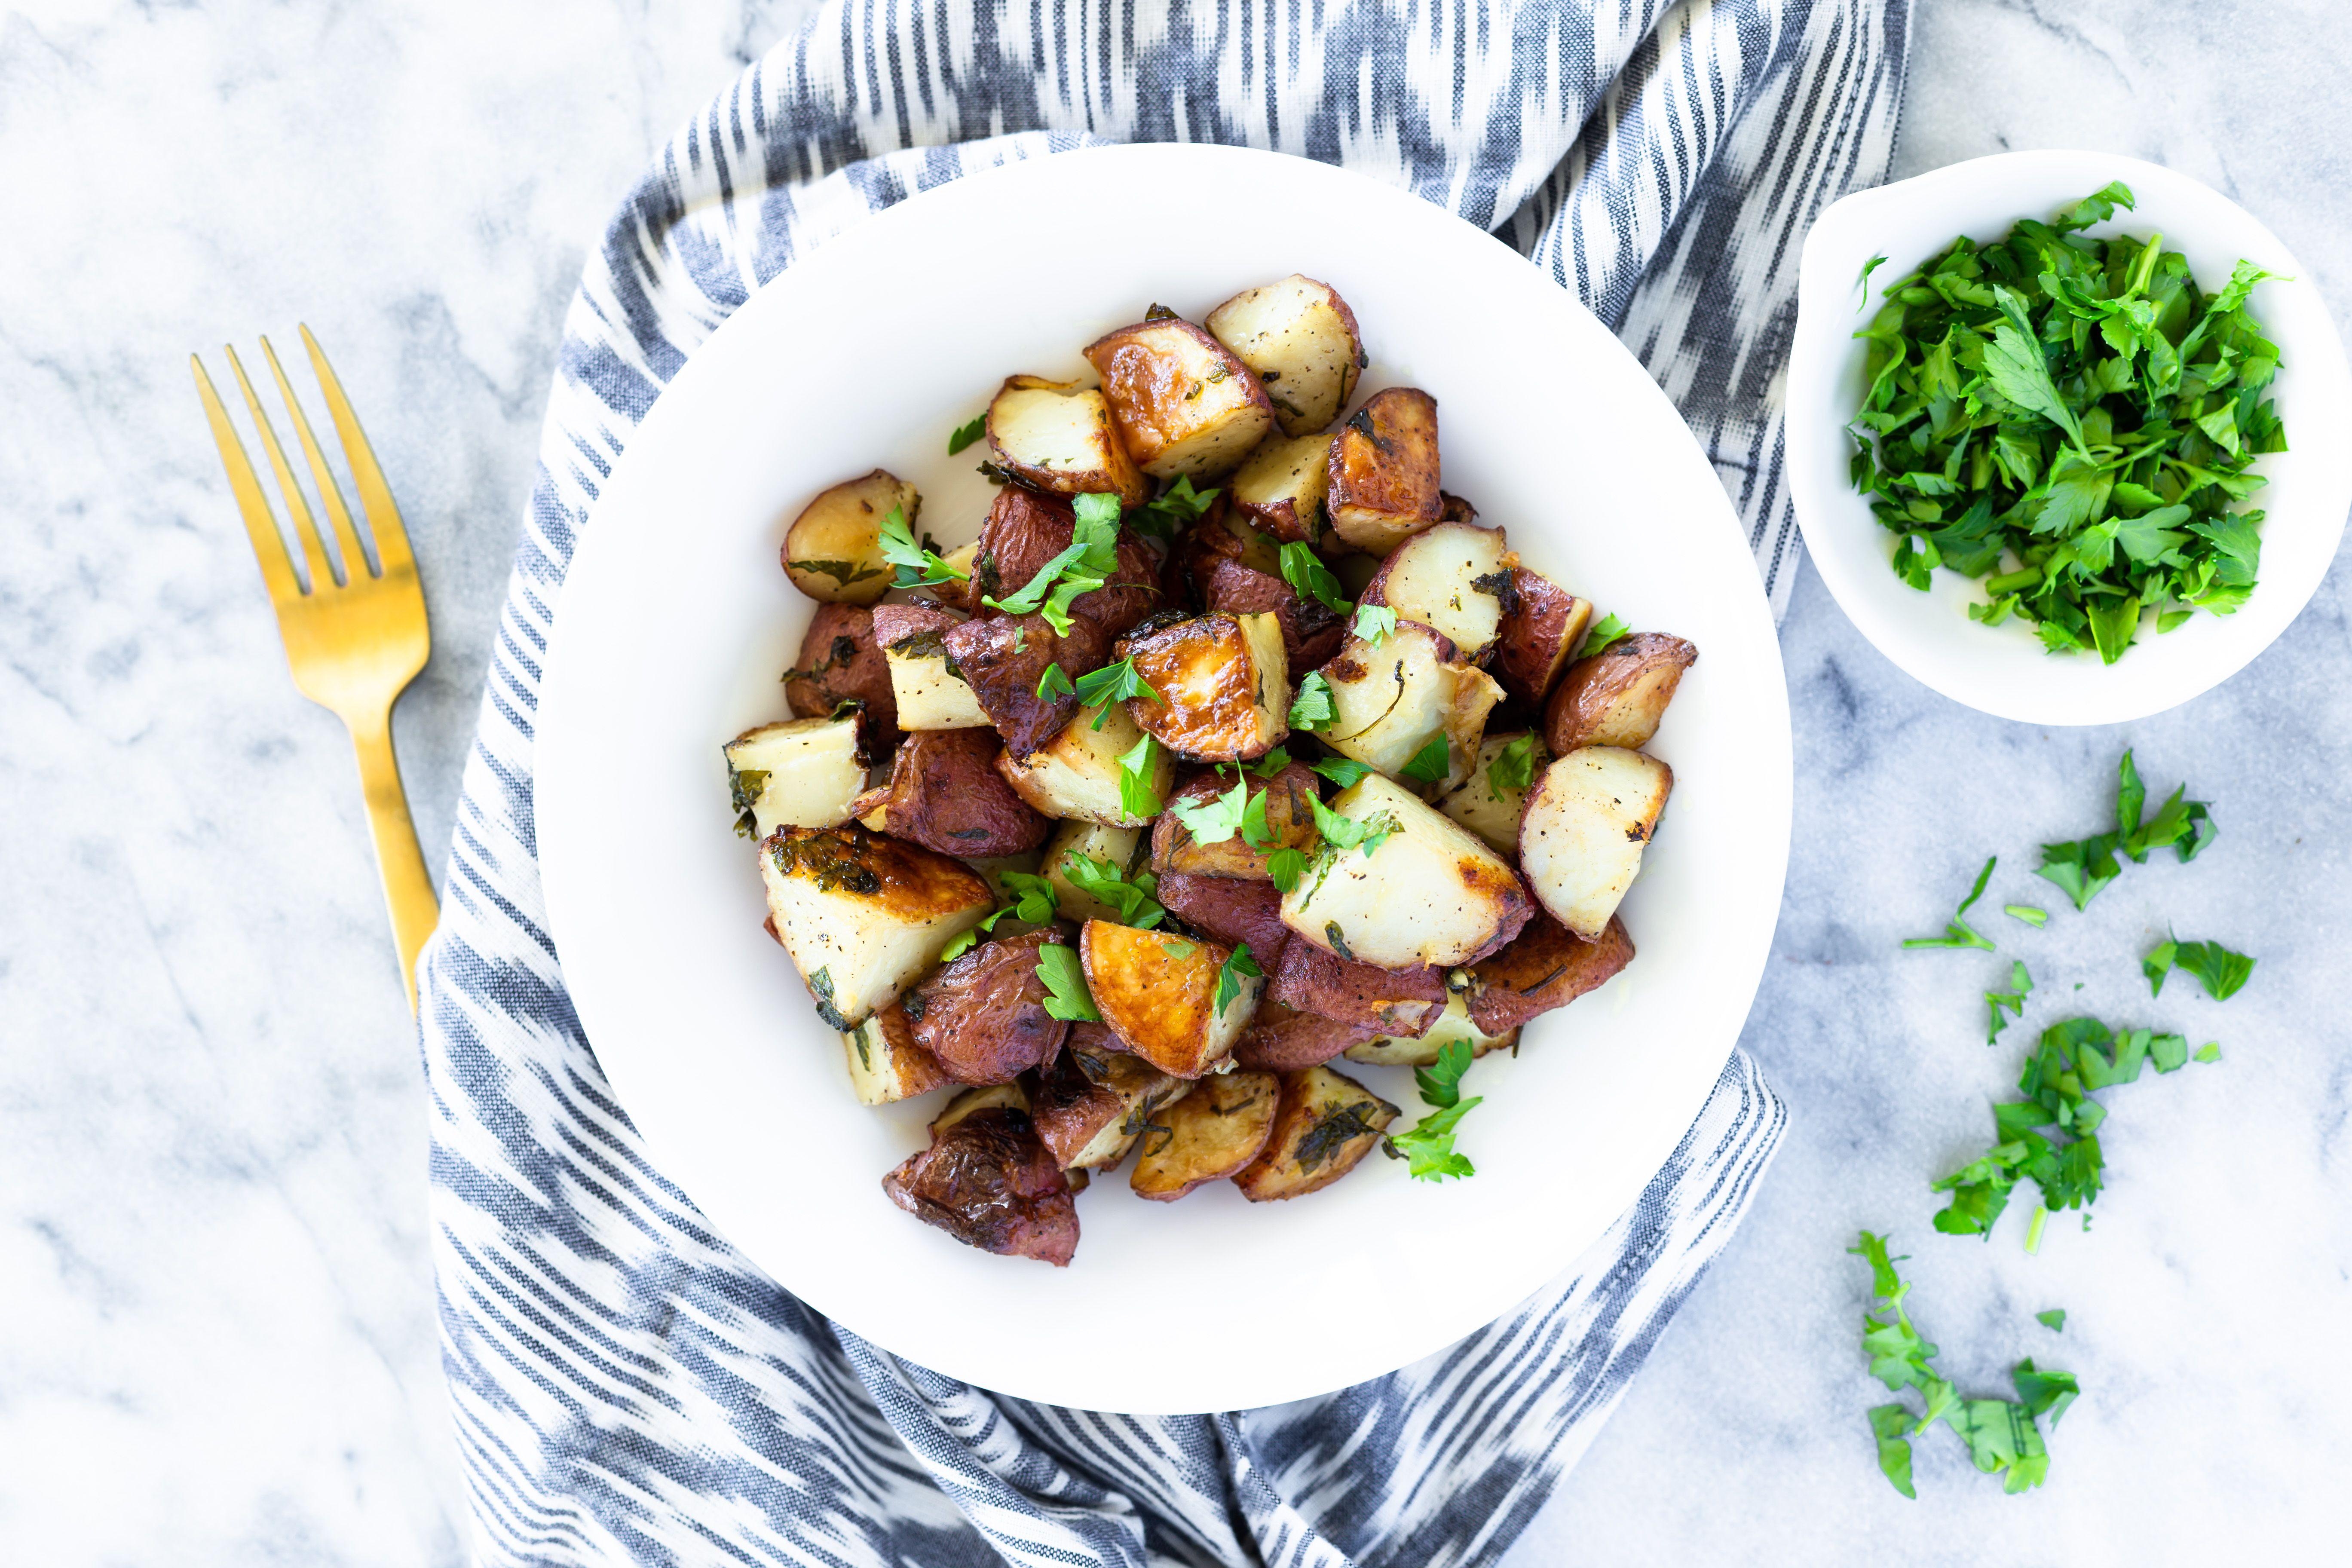 Basic roast potatoes